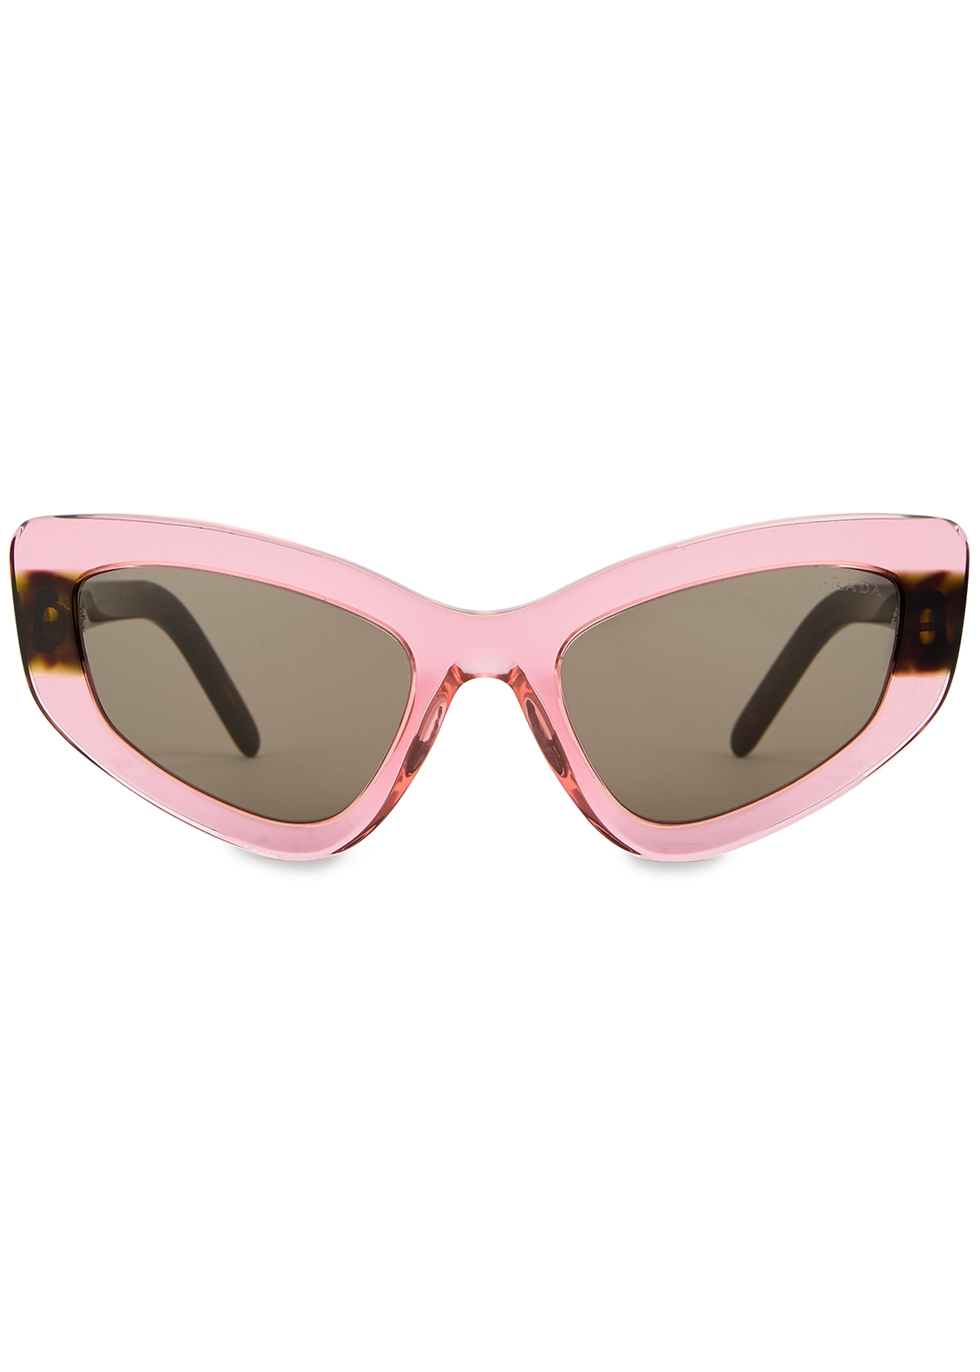 Pink transparent cat-eye sunglasses - Prada